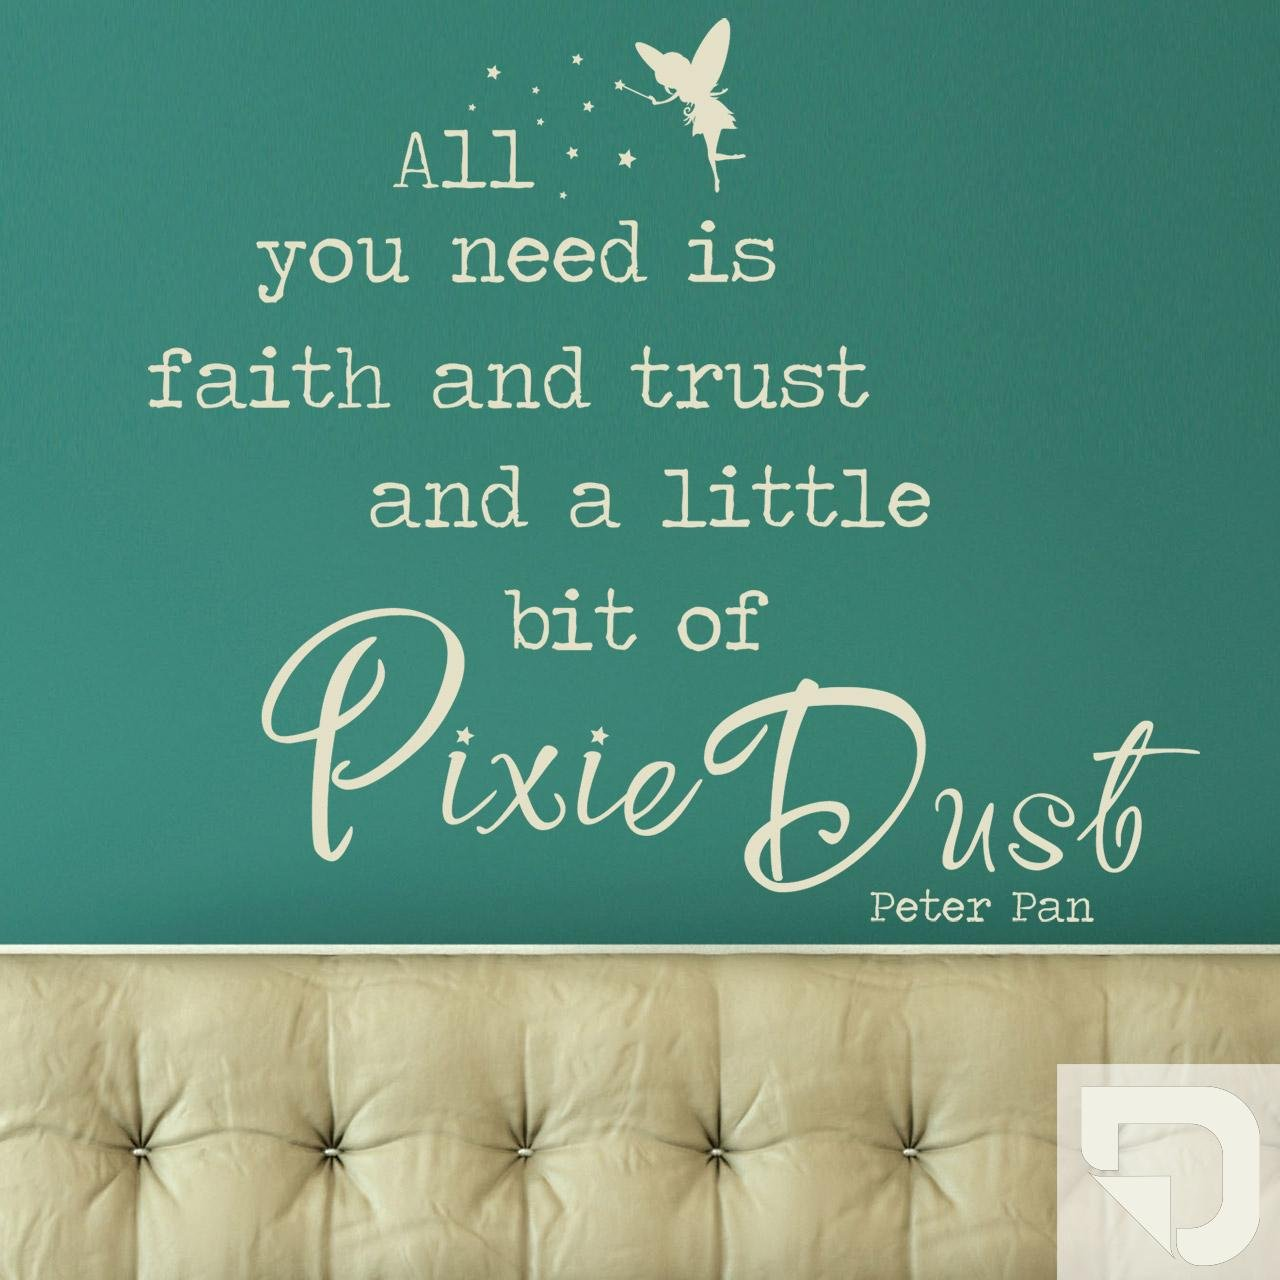 DESIGNSCAPE® Wandtattoo All you need is is is faith and trust an a little bit of Pixie Dust - Peter Pan Zitat 90 x 77 cm (Breite x Höhe) braun DW802125-M-F9 B01H4TLO6S Wandtattoos & Wandbilder c49f7c